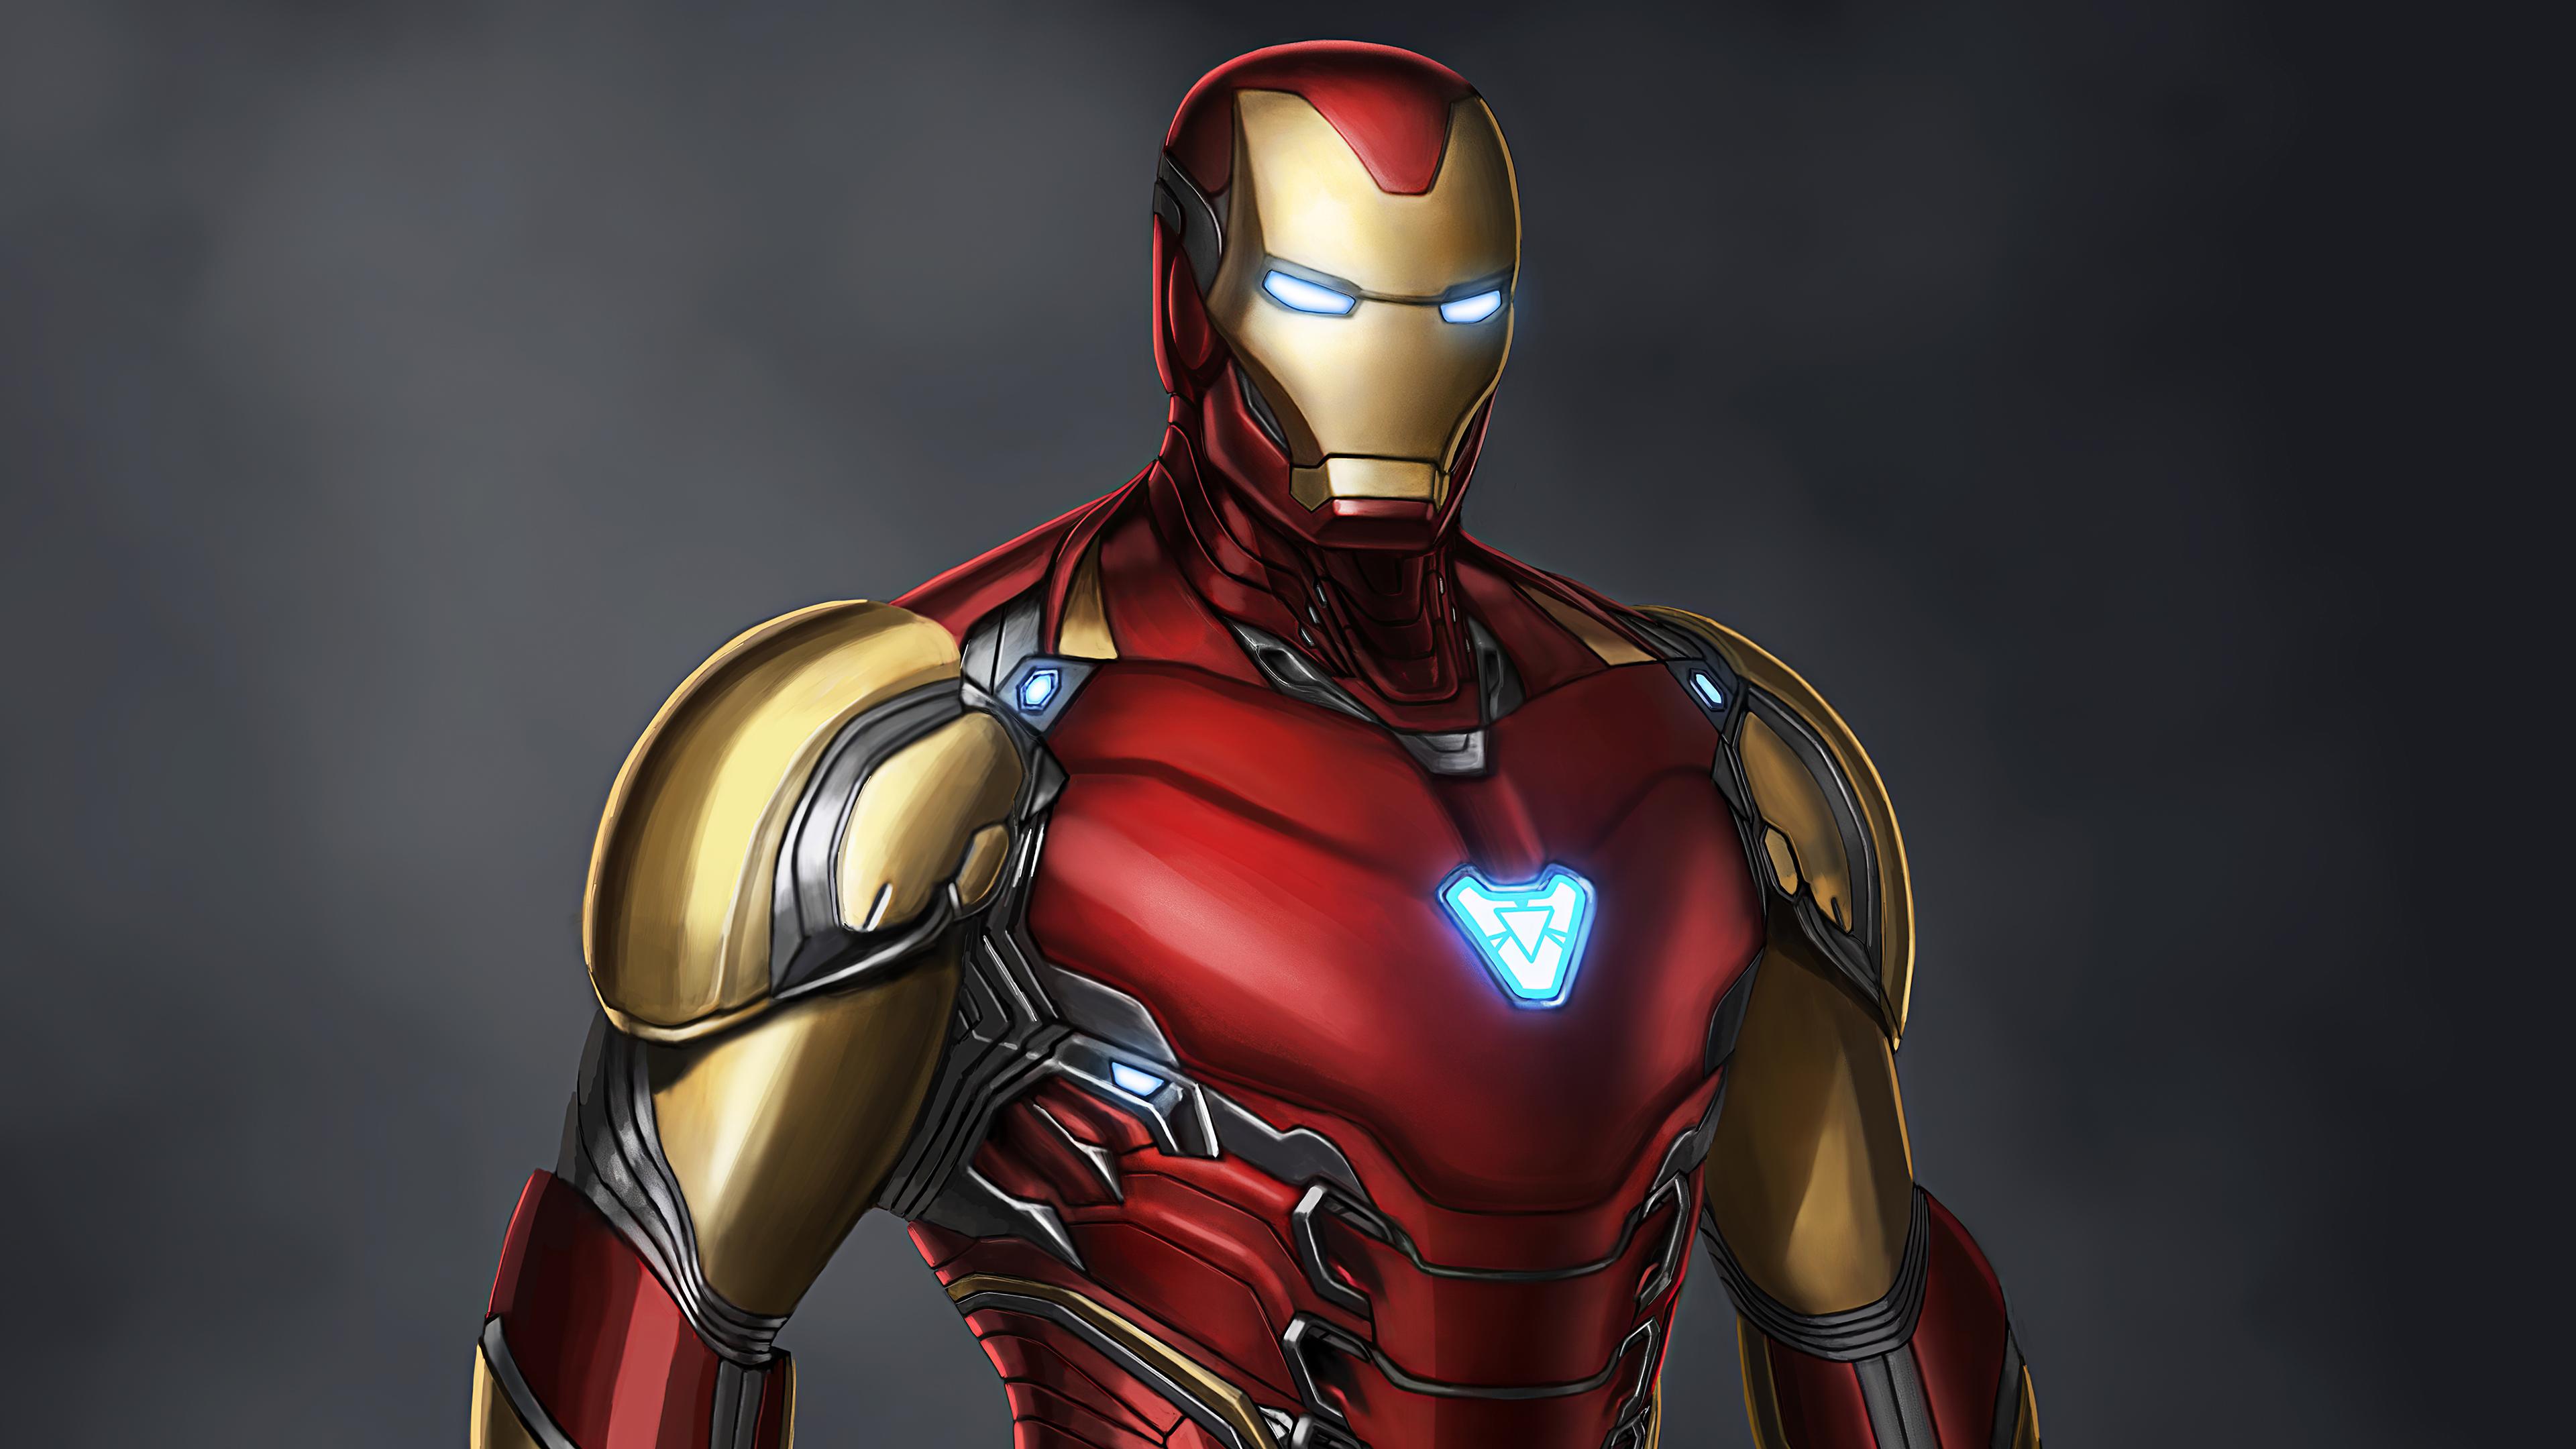 Iron Man Concept Art 4k, HD Superheroes, 4k Wallpapers ...